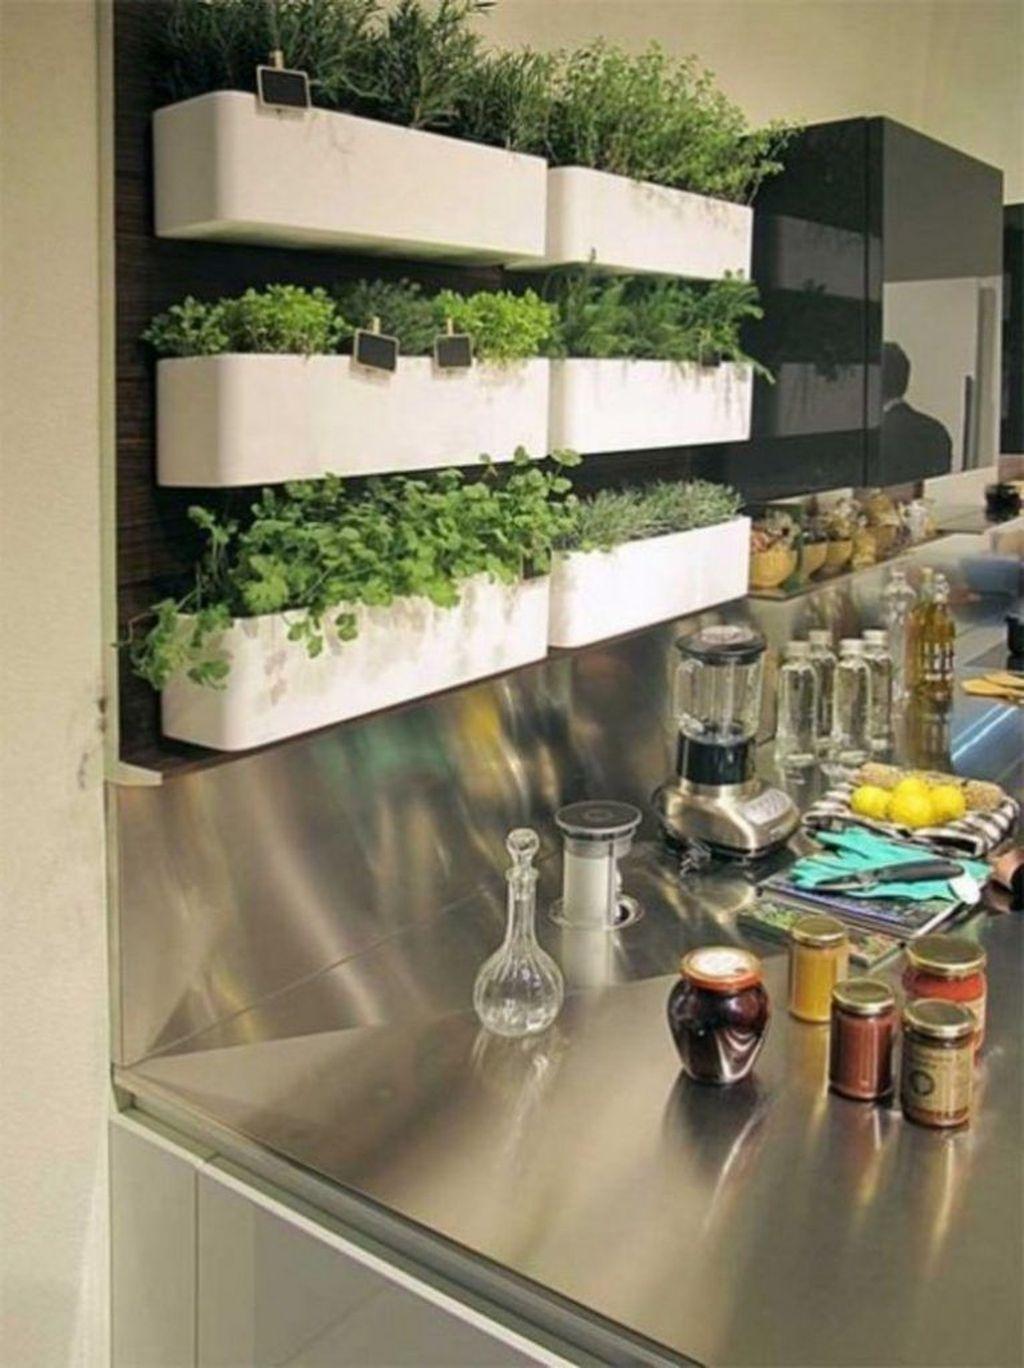 The Best Indoor Garden Ideas To Beautify Your Home 14